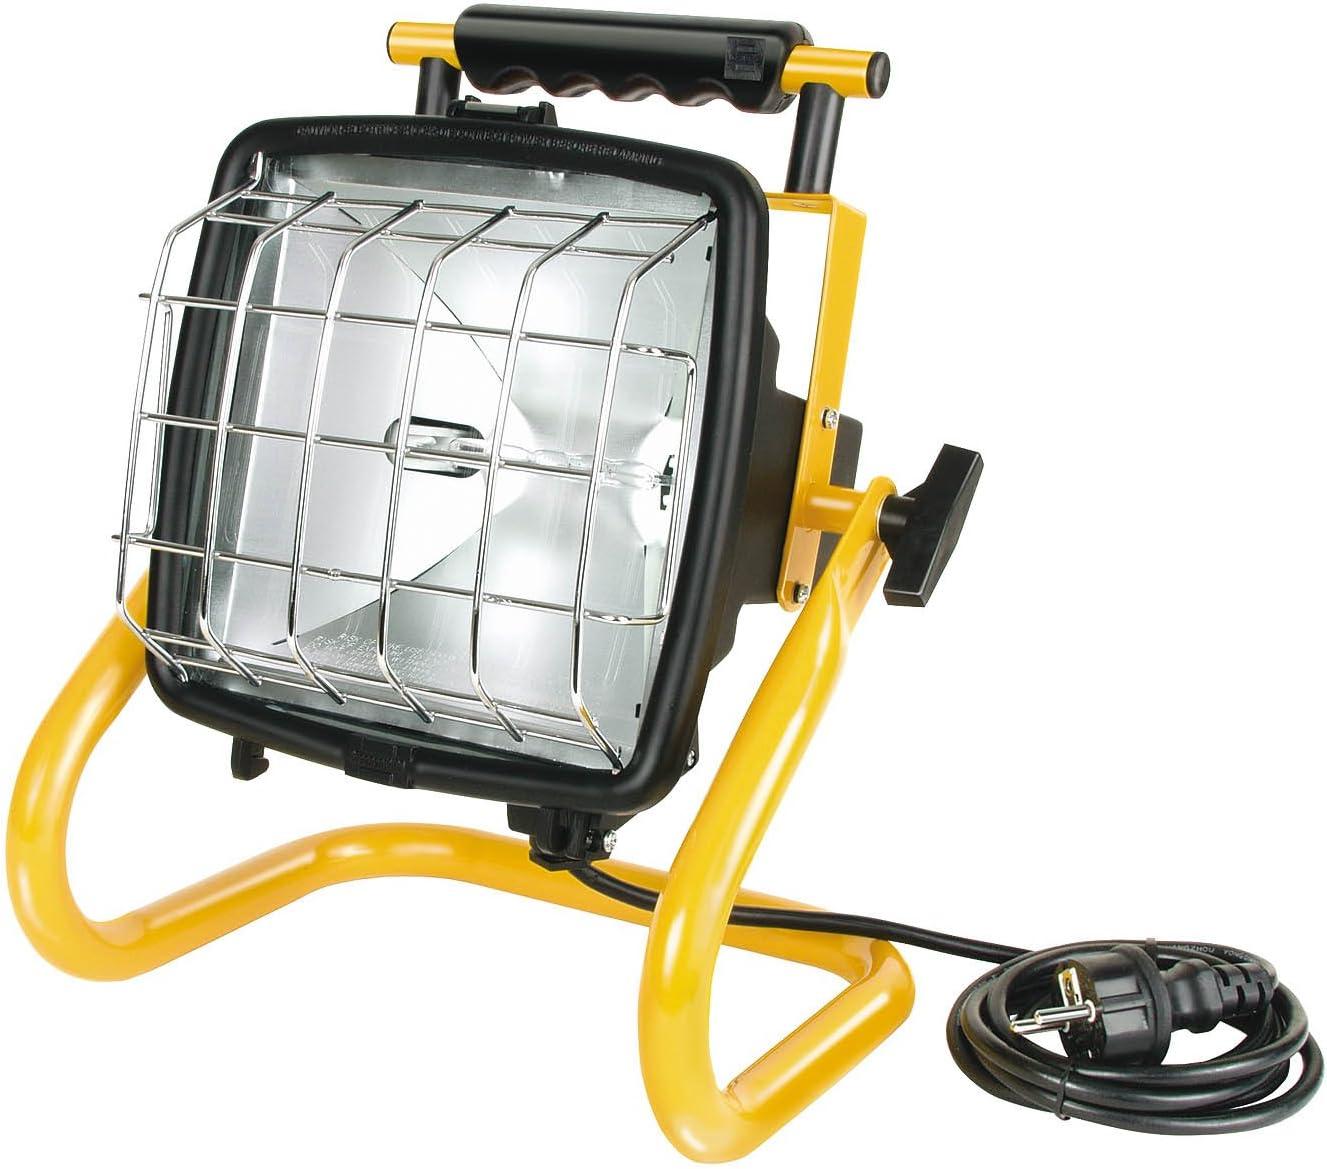 Brennenstuhl LED Baustrahler Bau Strahler Leuchte mit Stativ außen IP54 1720 Lm